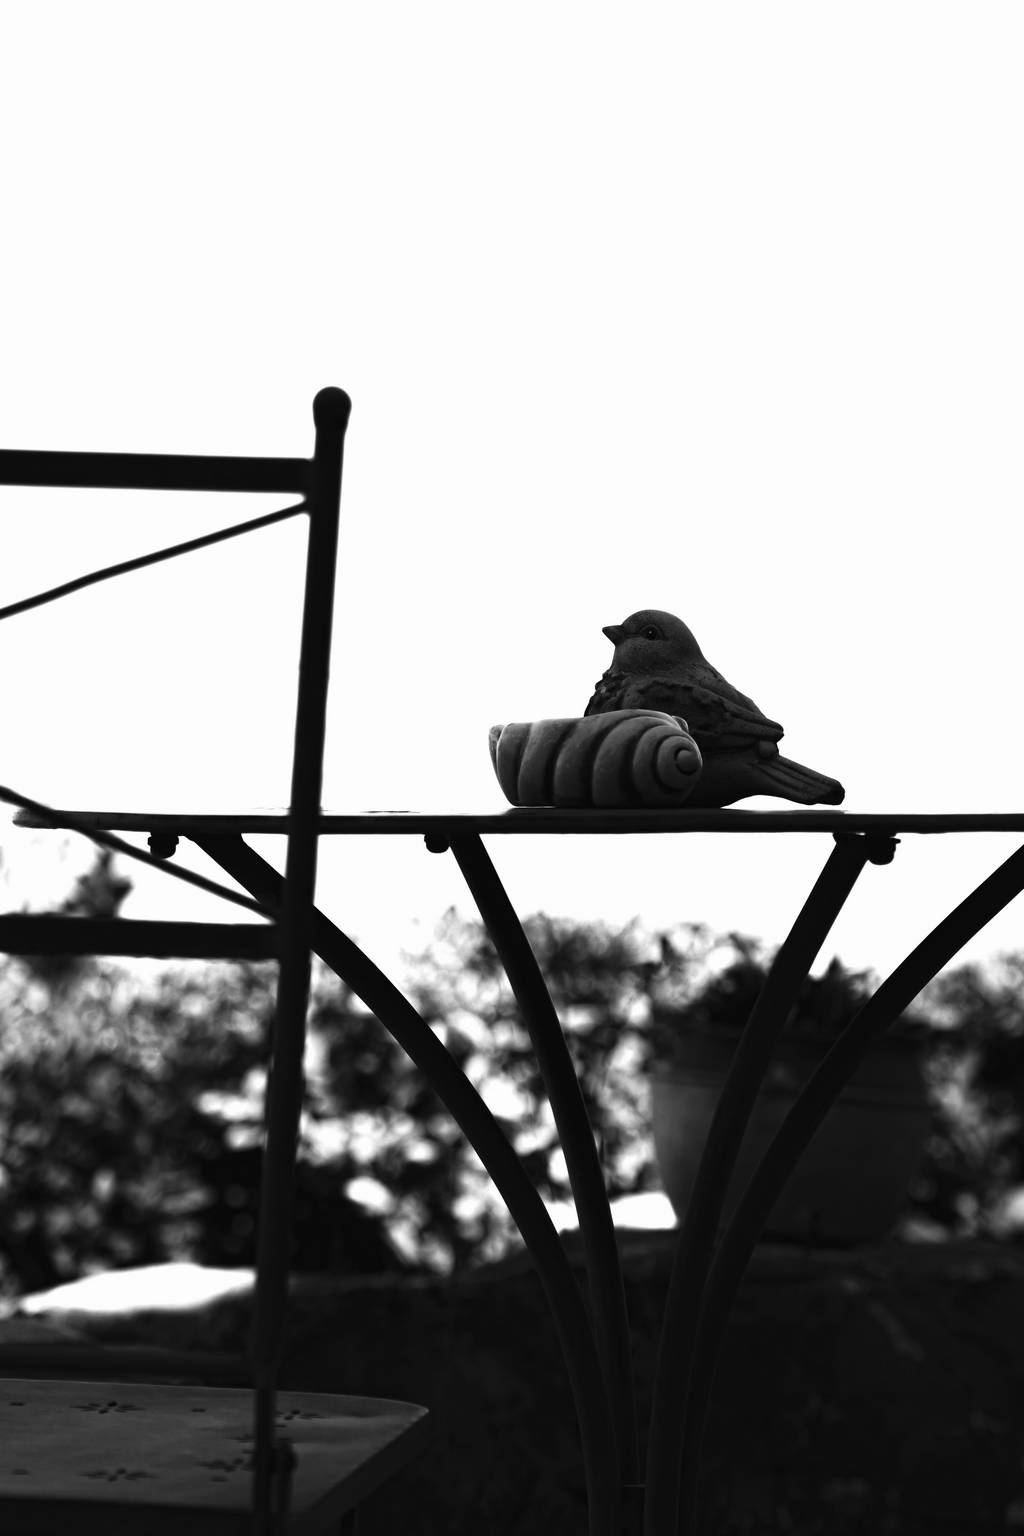 Bird_B&W_DSC0046.jpg